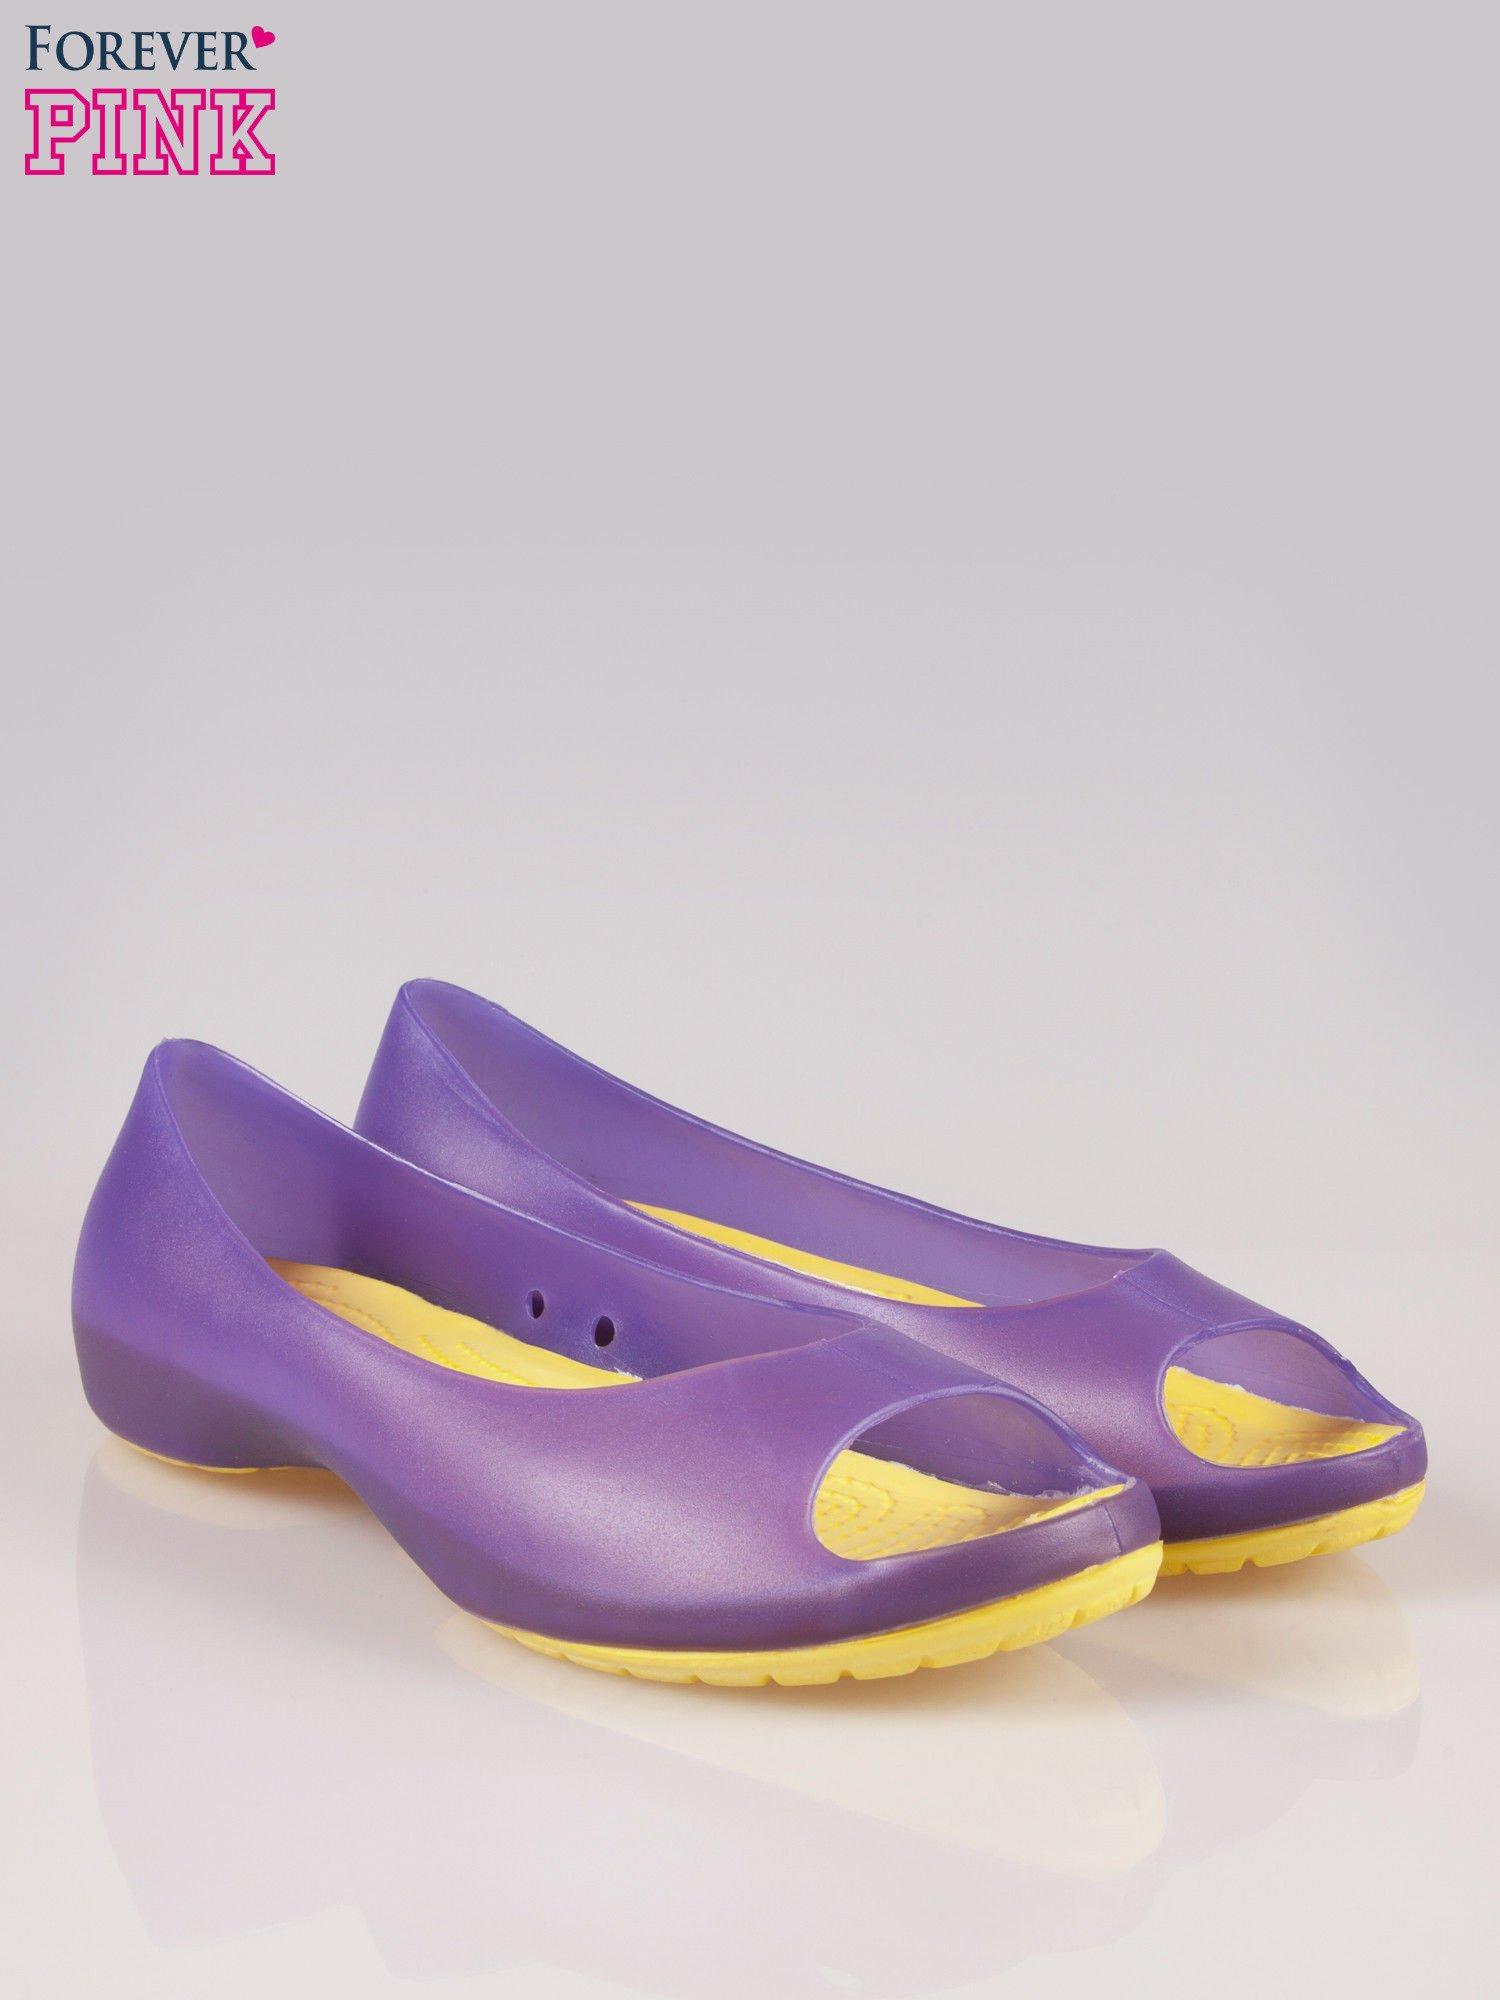 Fioletowe gumowe baleriny peep toe                                  zdj.                                  2